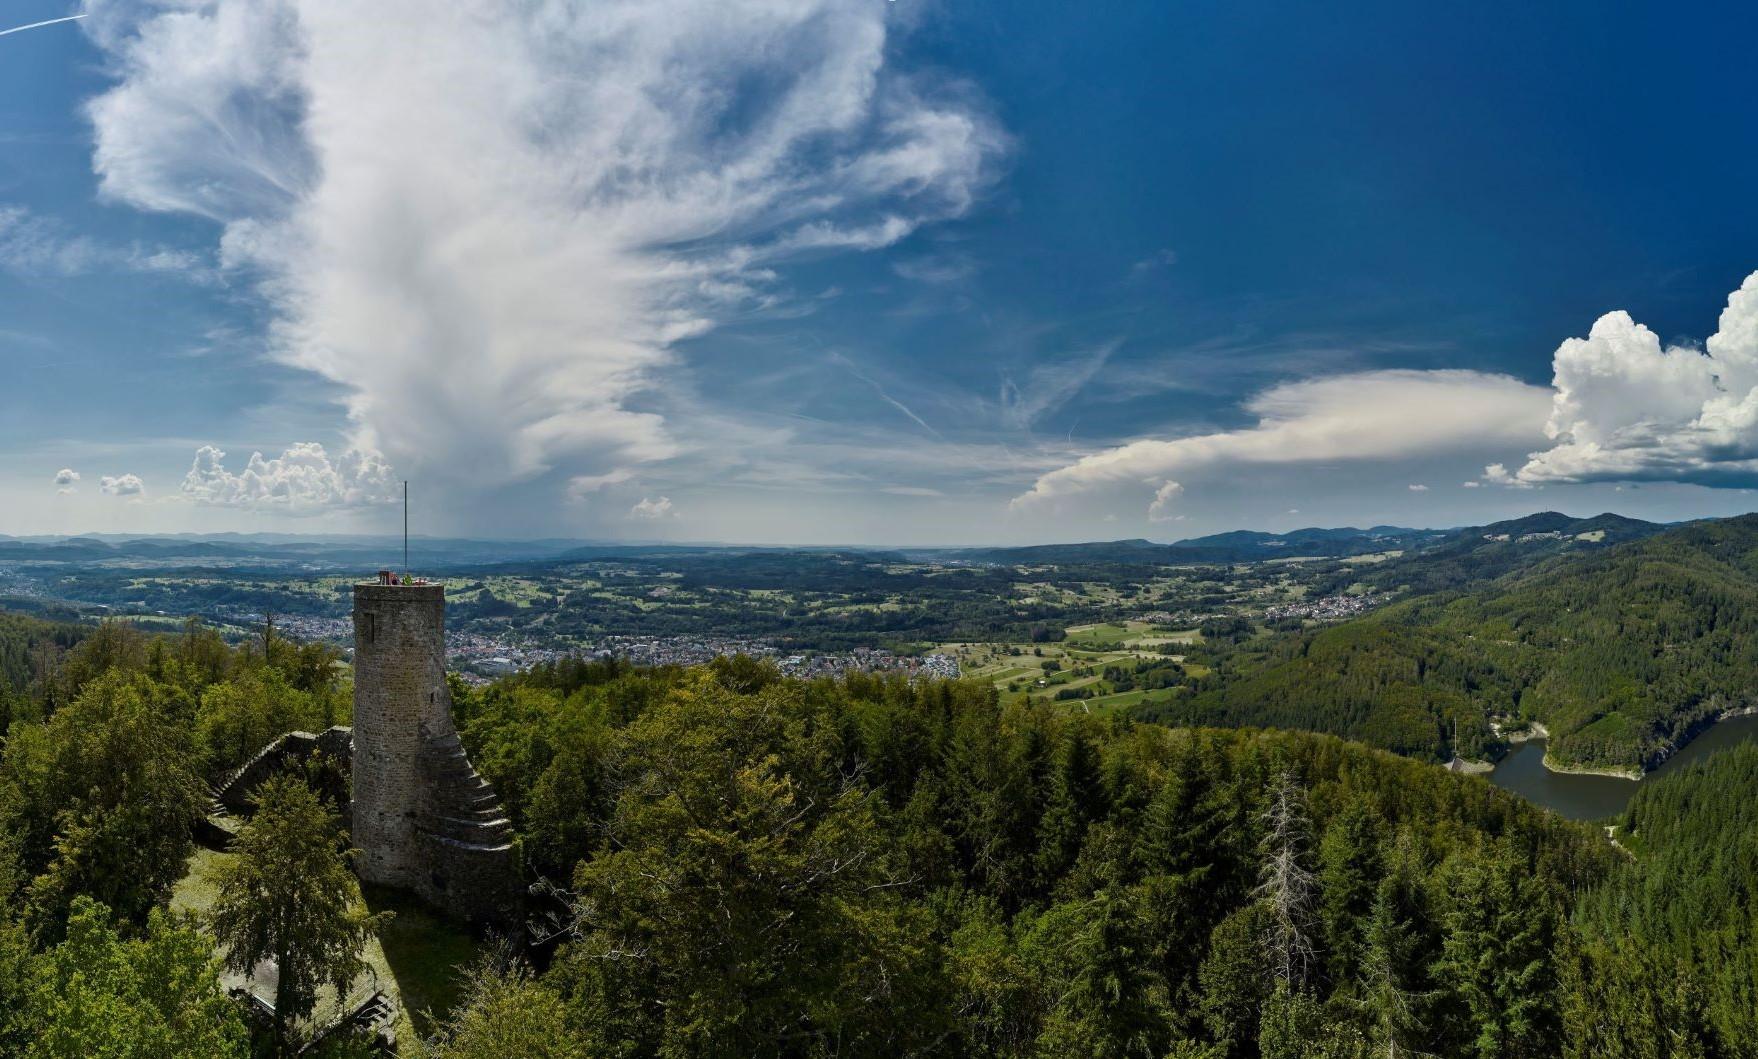 Burgruine, Bärenfels, Wehr, Burg, Bär, Ferienwelt, Südschwarzwald, Schwarzwald, Landschaft, Aussicht, Aussichtsturm, Turm, Natur, Wald, Sommer, Frühling, Herbst, Ausflug, Bäume